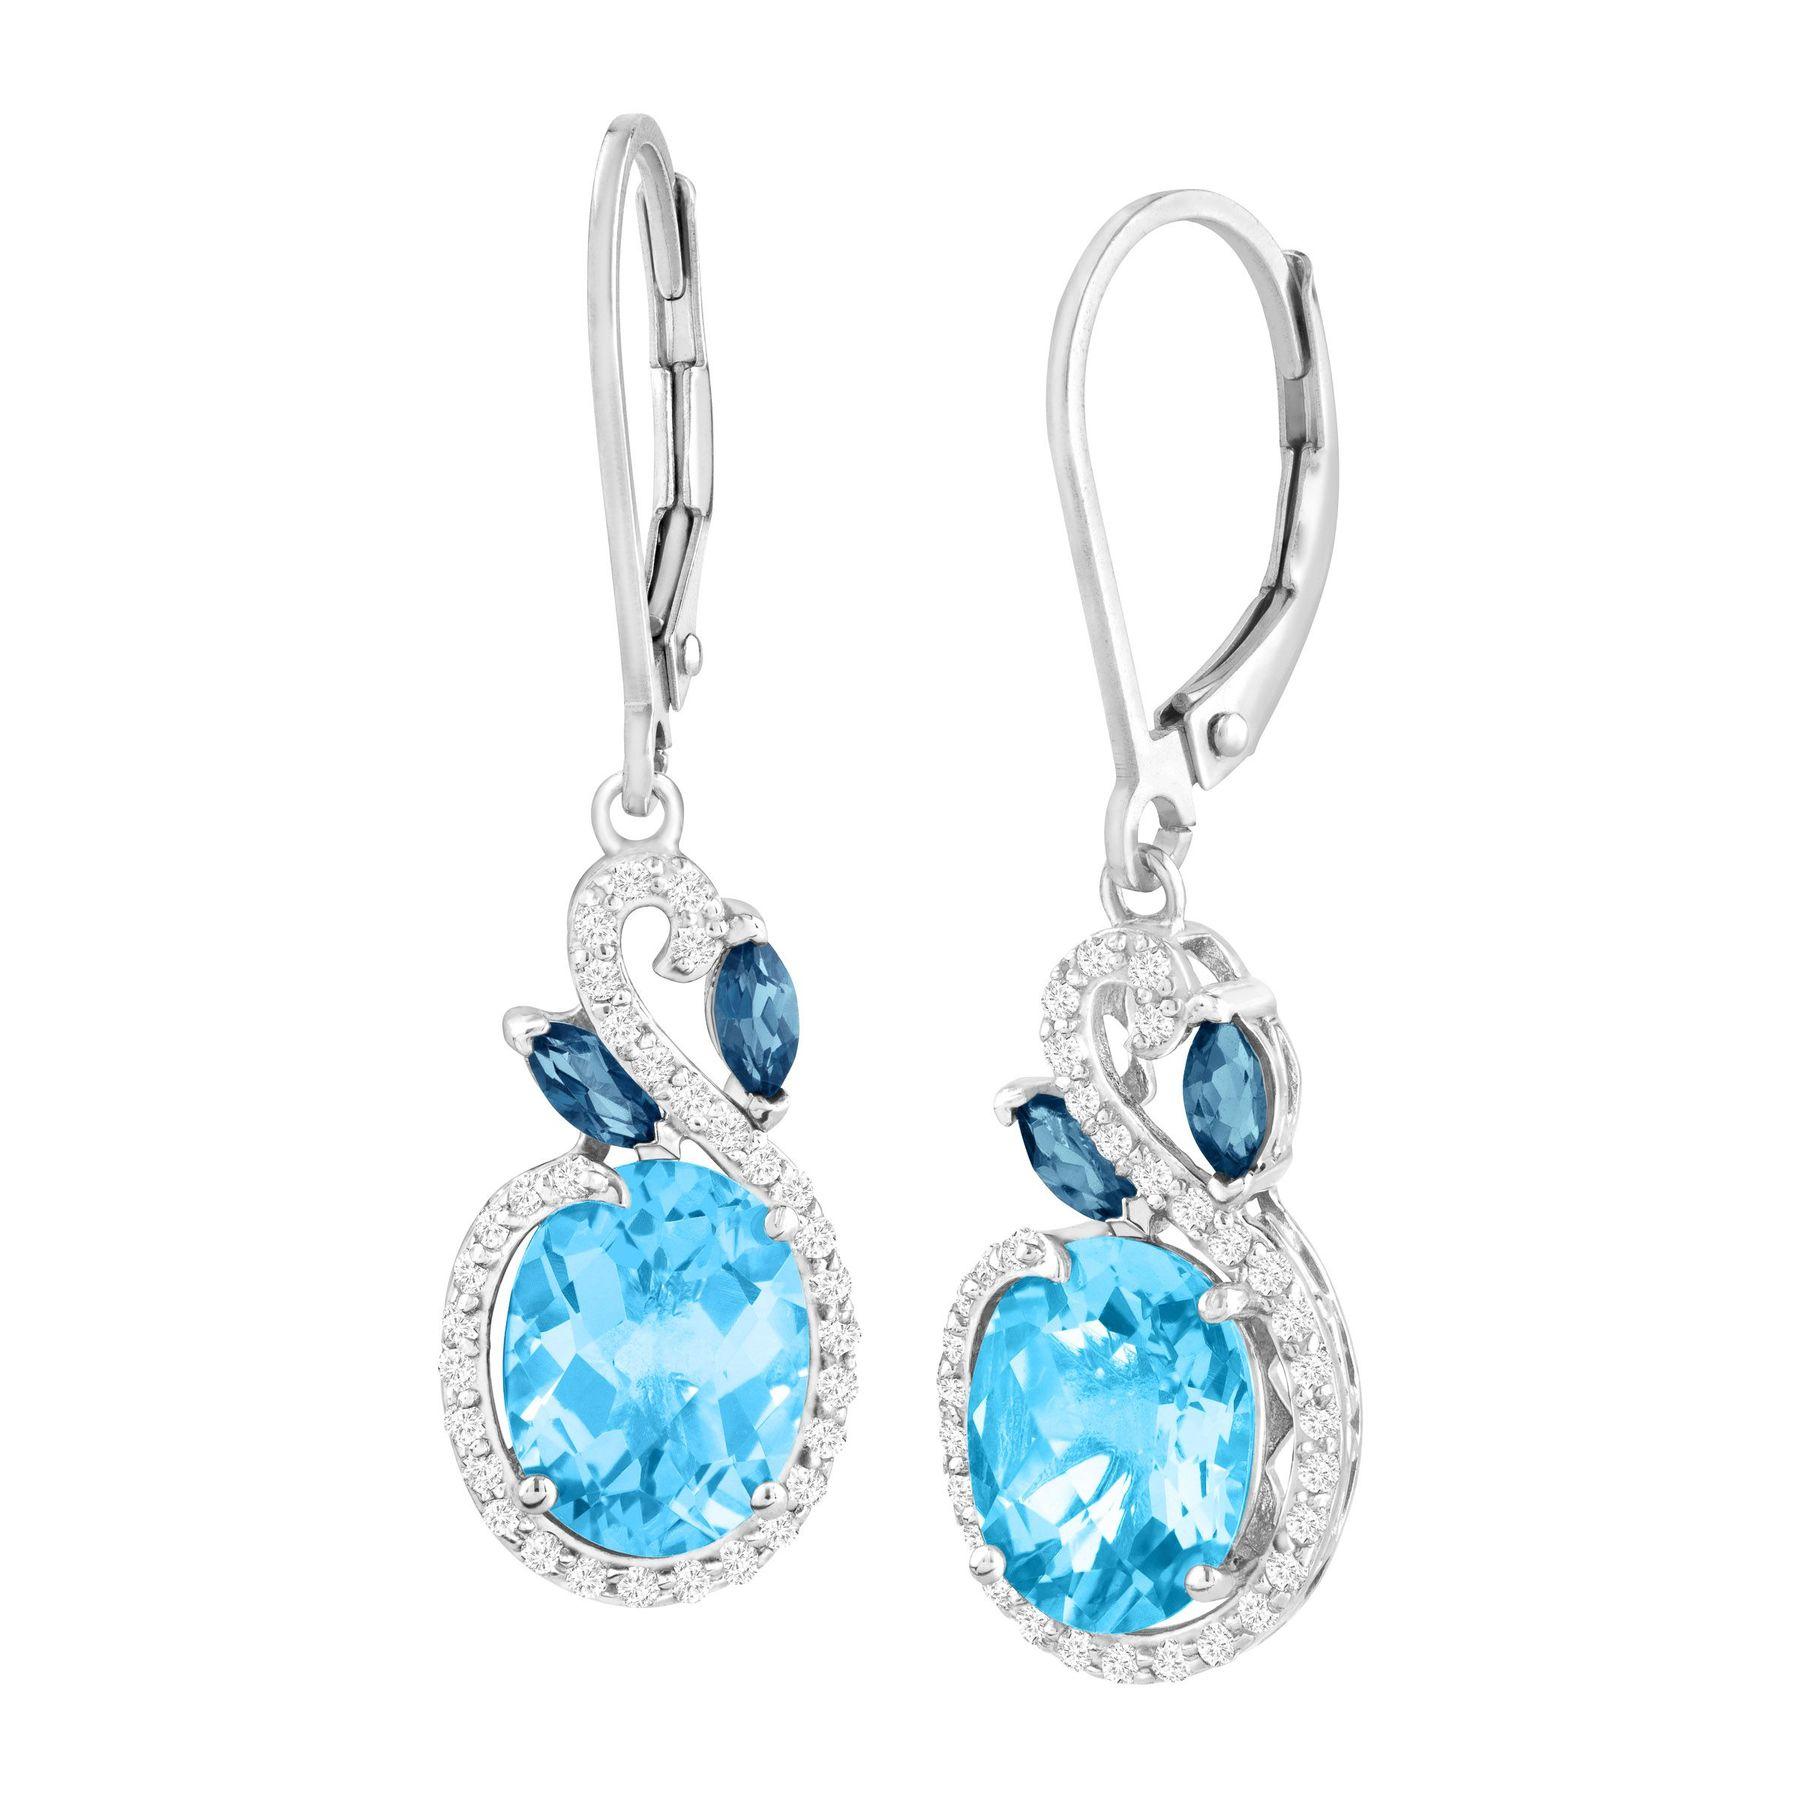 5 3 8 Ct Natural London Swiss Blue White Topaz Drop Earrings In Sterling Silver